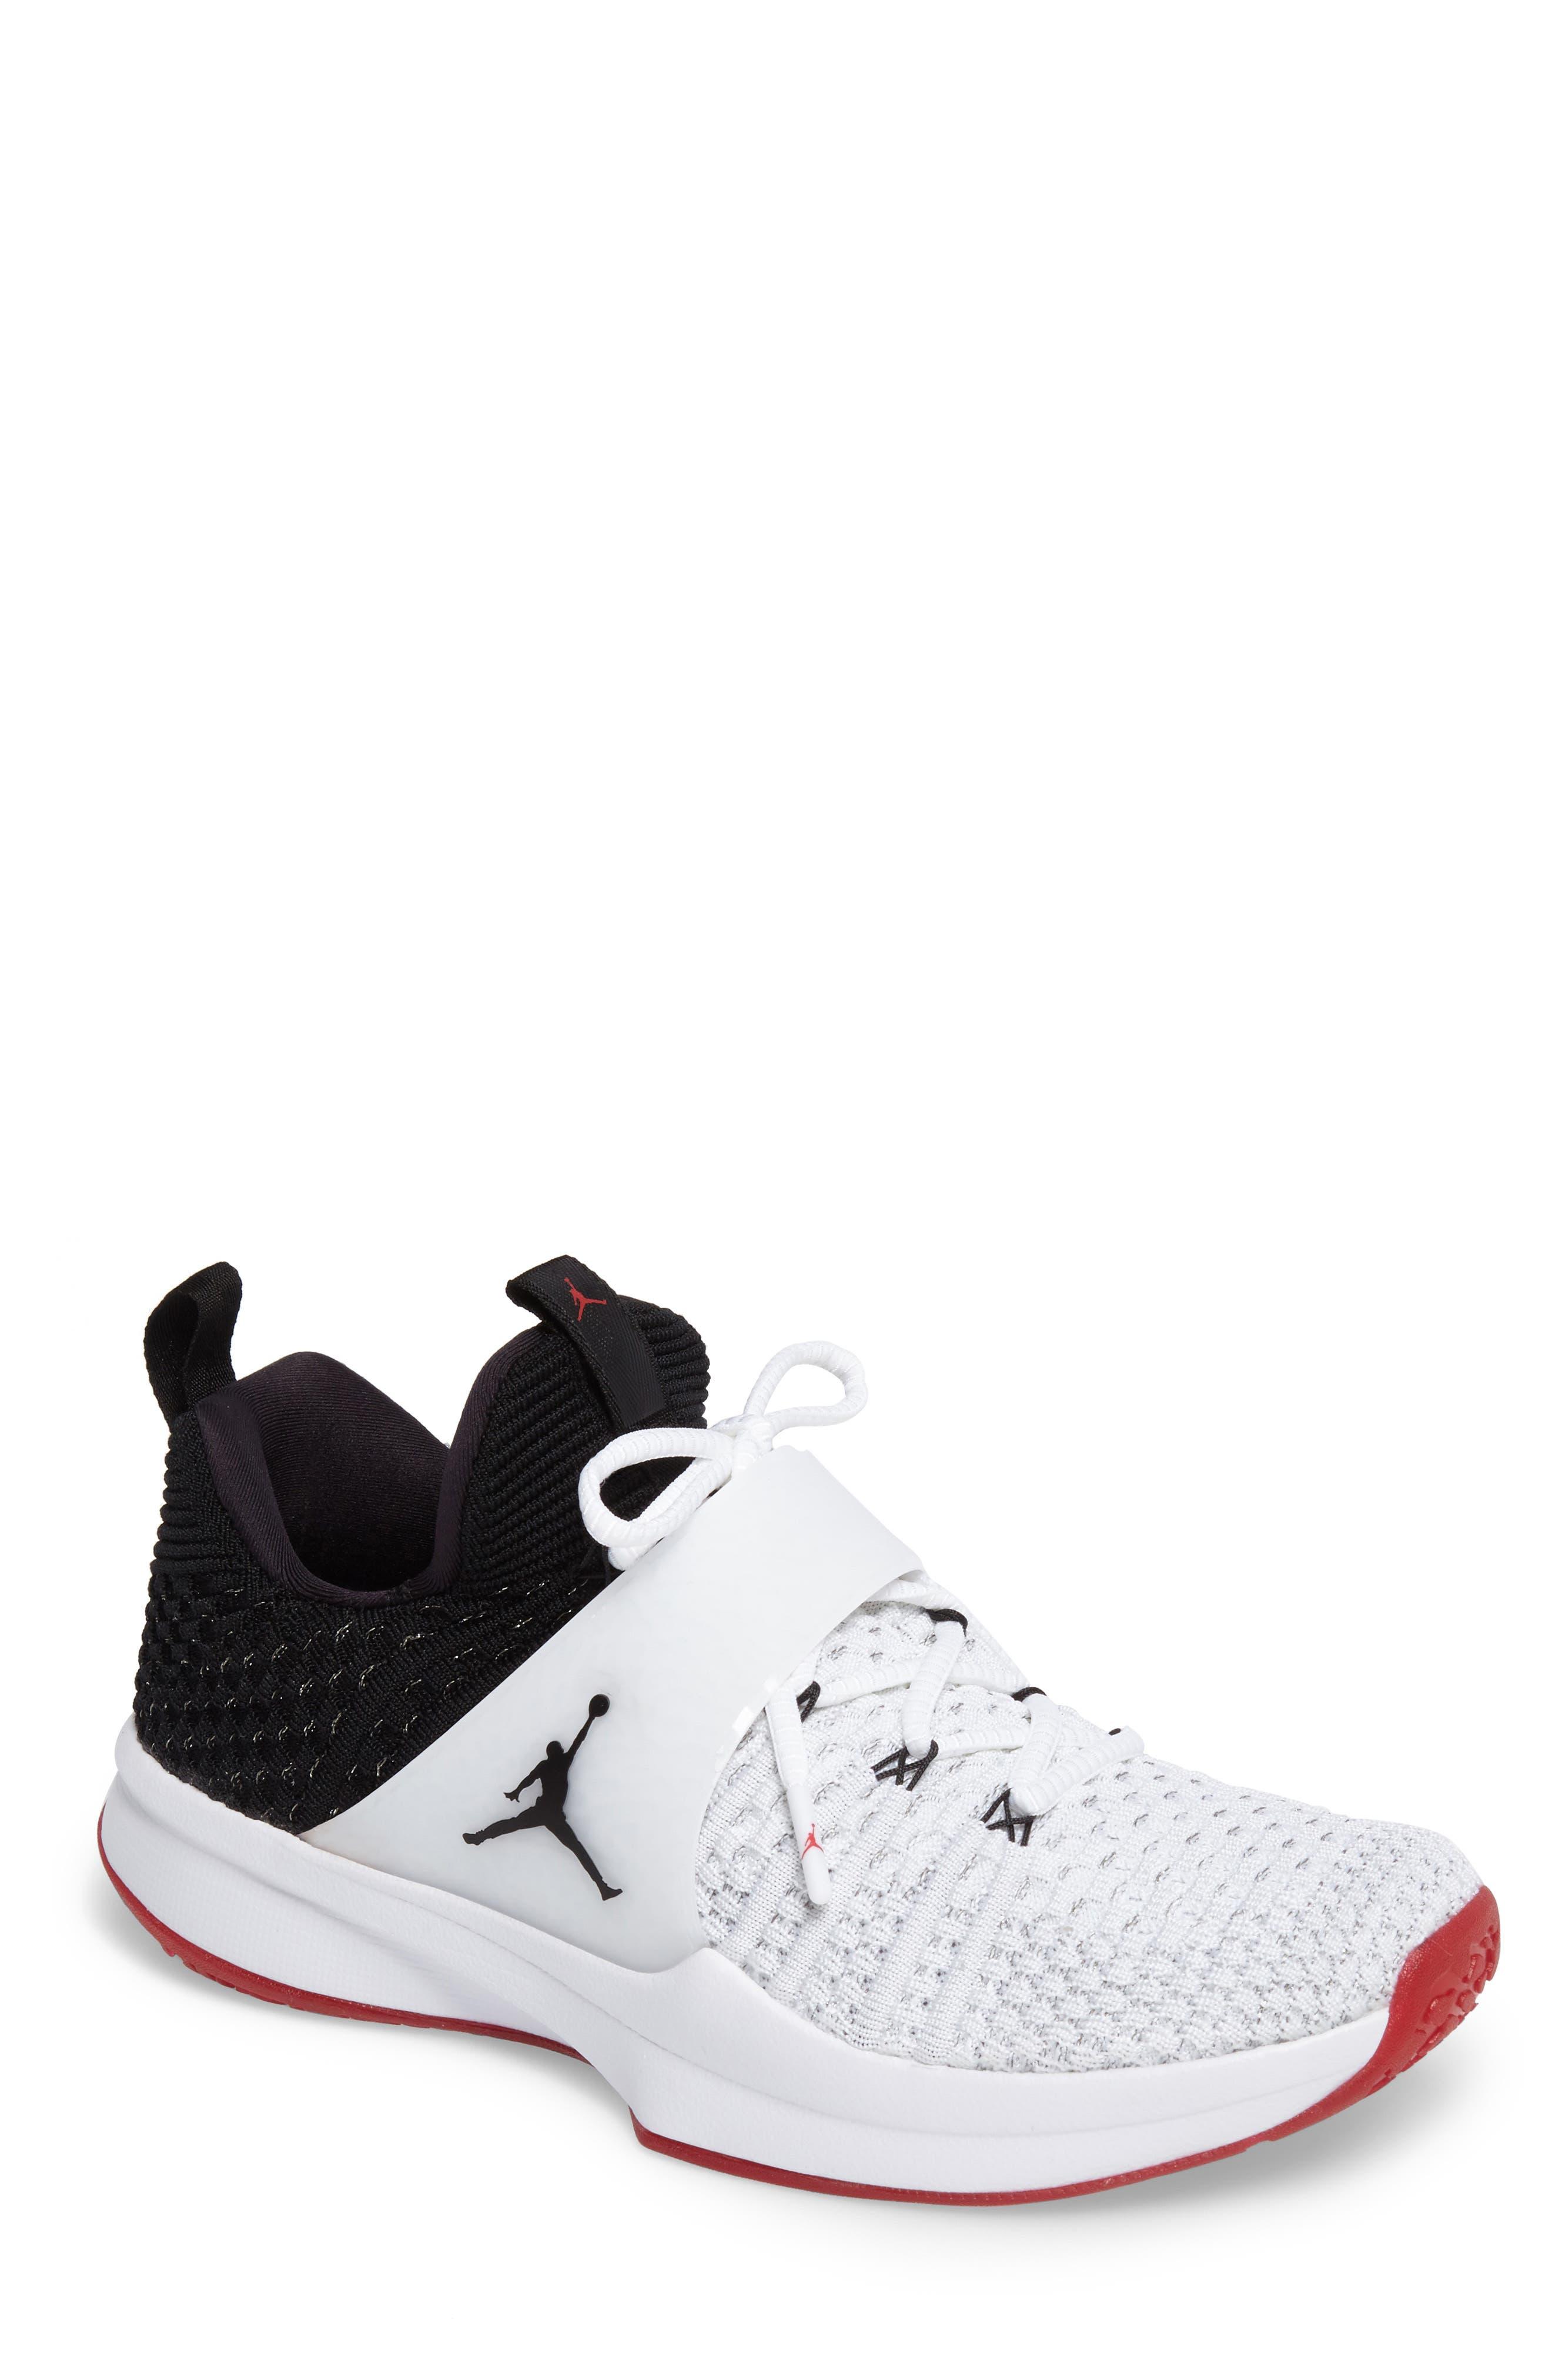 Jordan Flyknit Trainer 2 Low Sneaker,                             Main thumbnail 1, color,                             White/ Black/ Black/ Gym Red